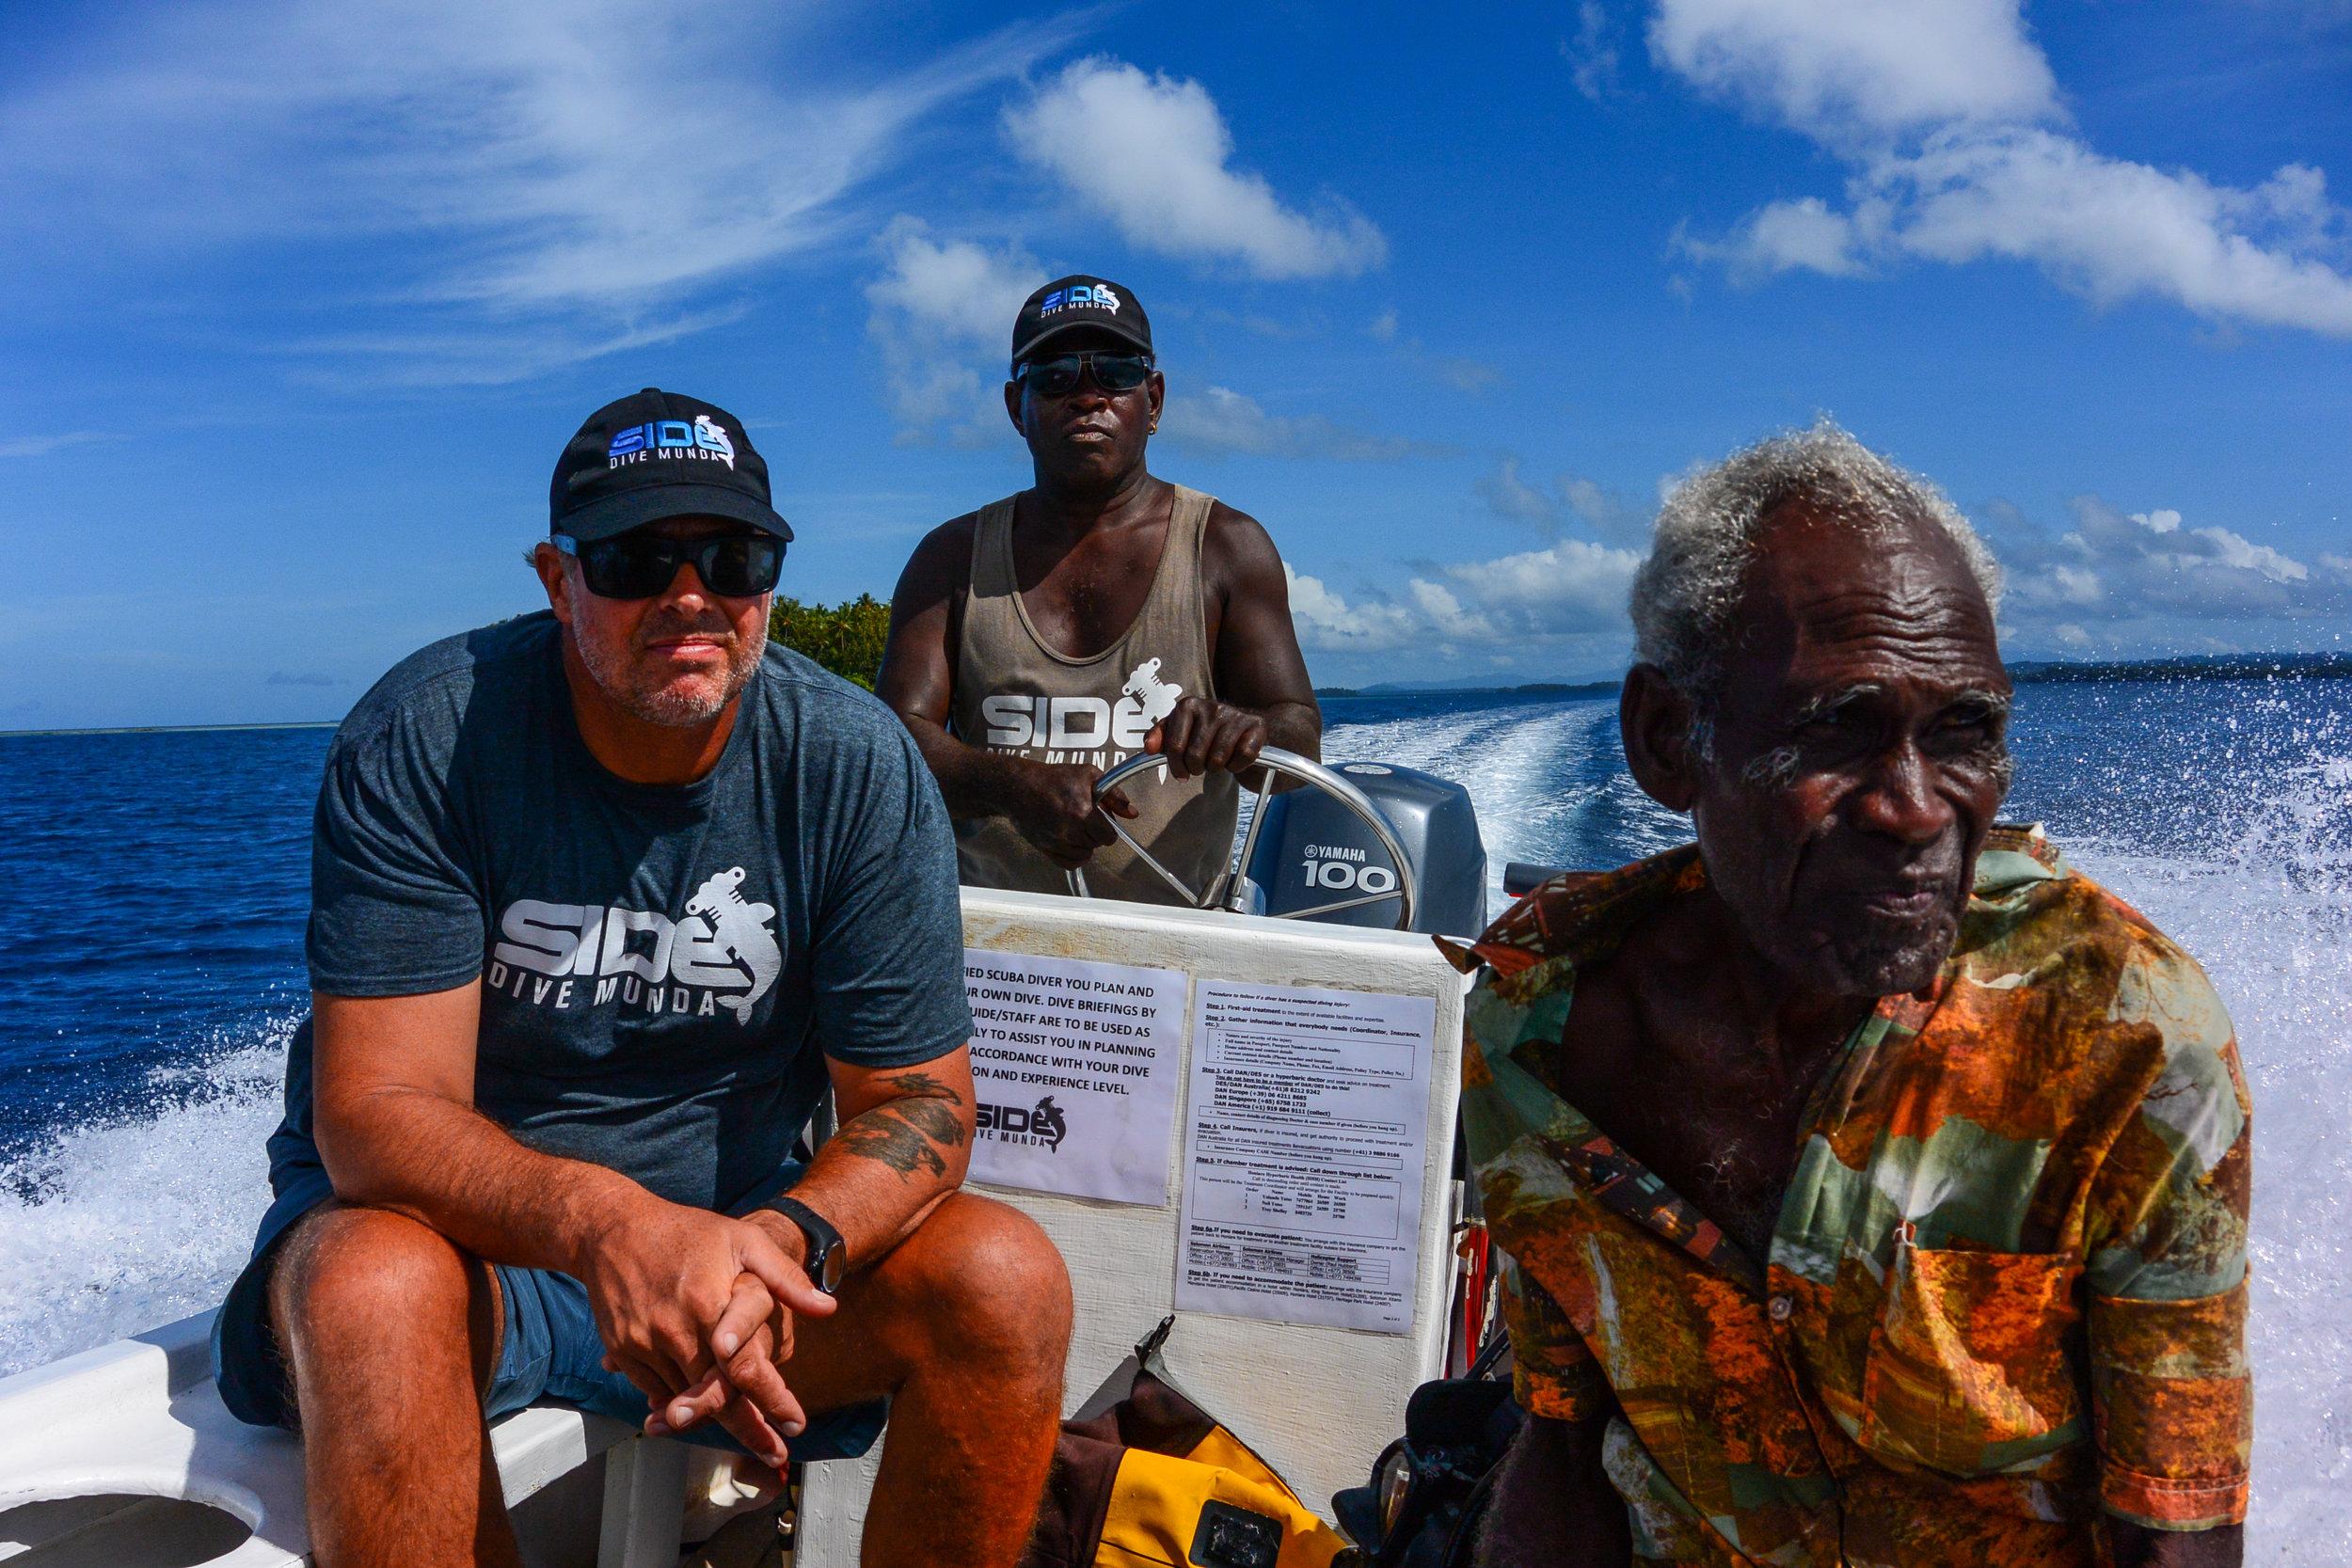 Freedivers exploring with Dive Munda team and WWII legend Alekana.